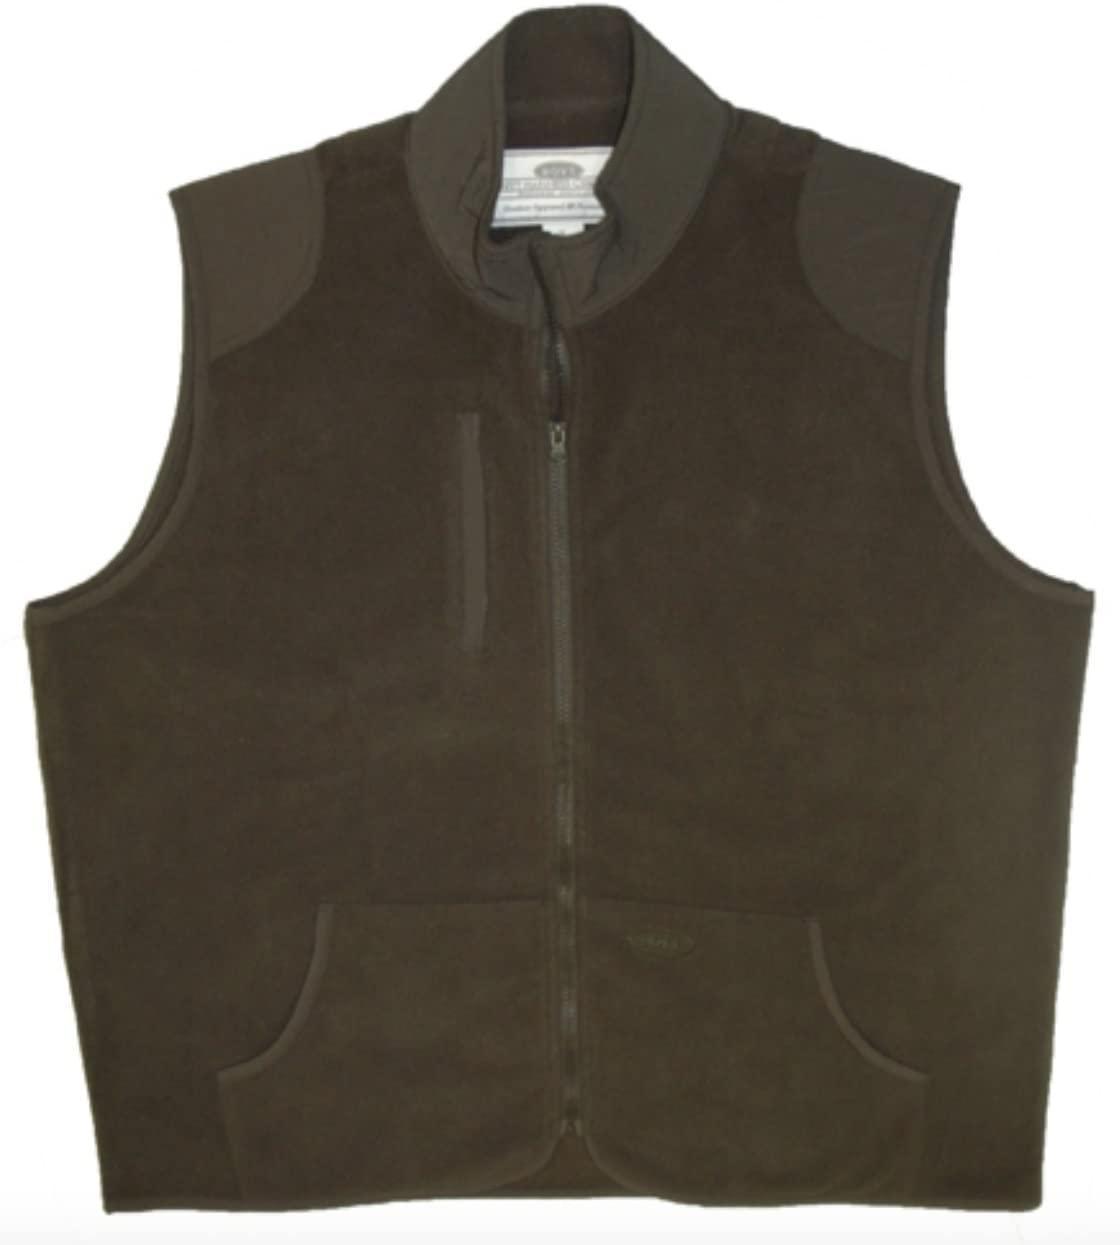 Boyt Harness 50504 Hu123 Boyt FLC Vest Grn 2X , Green